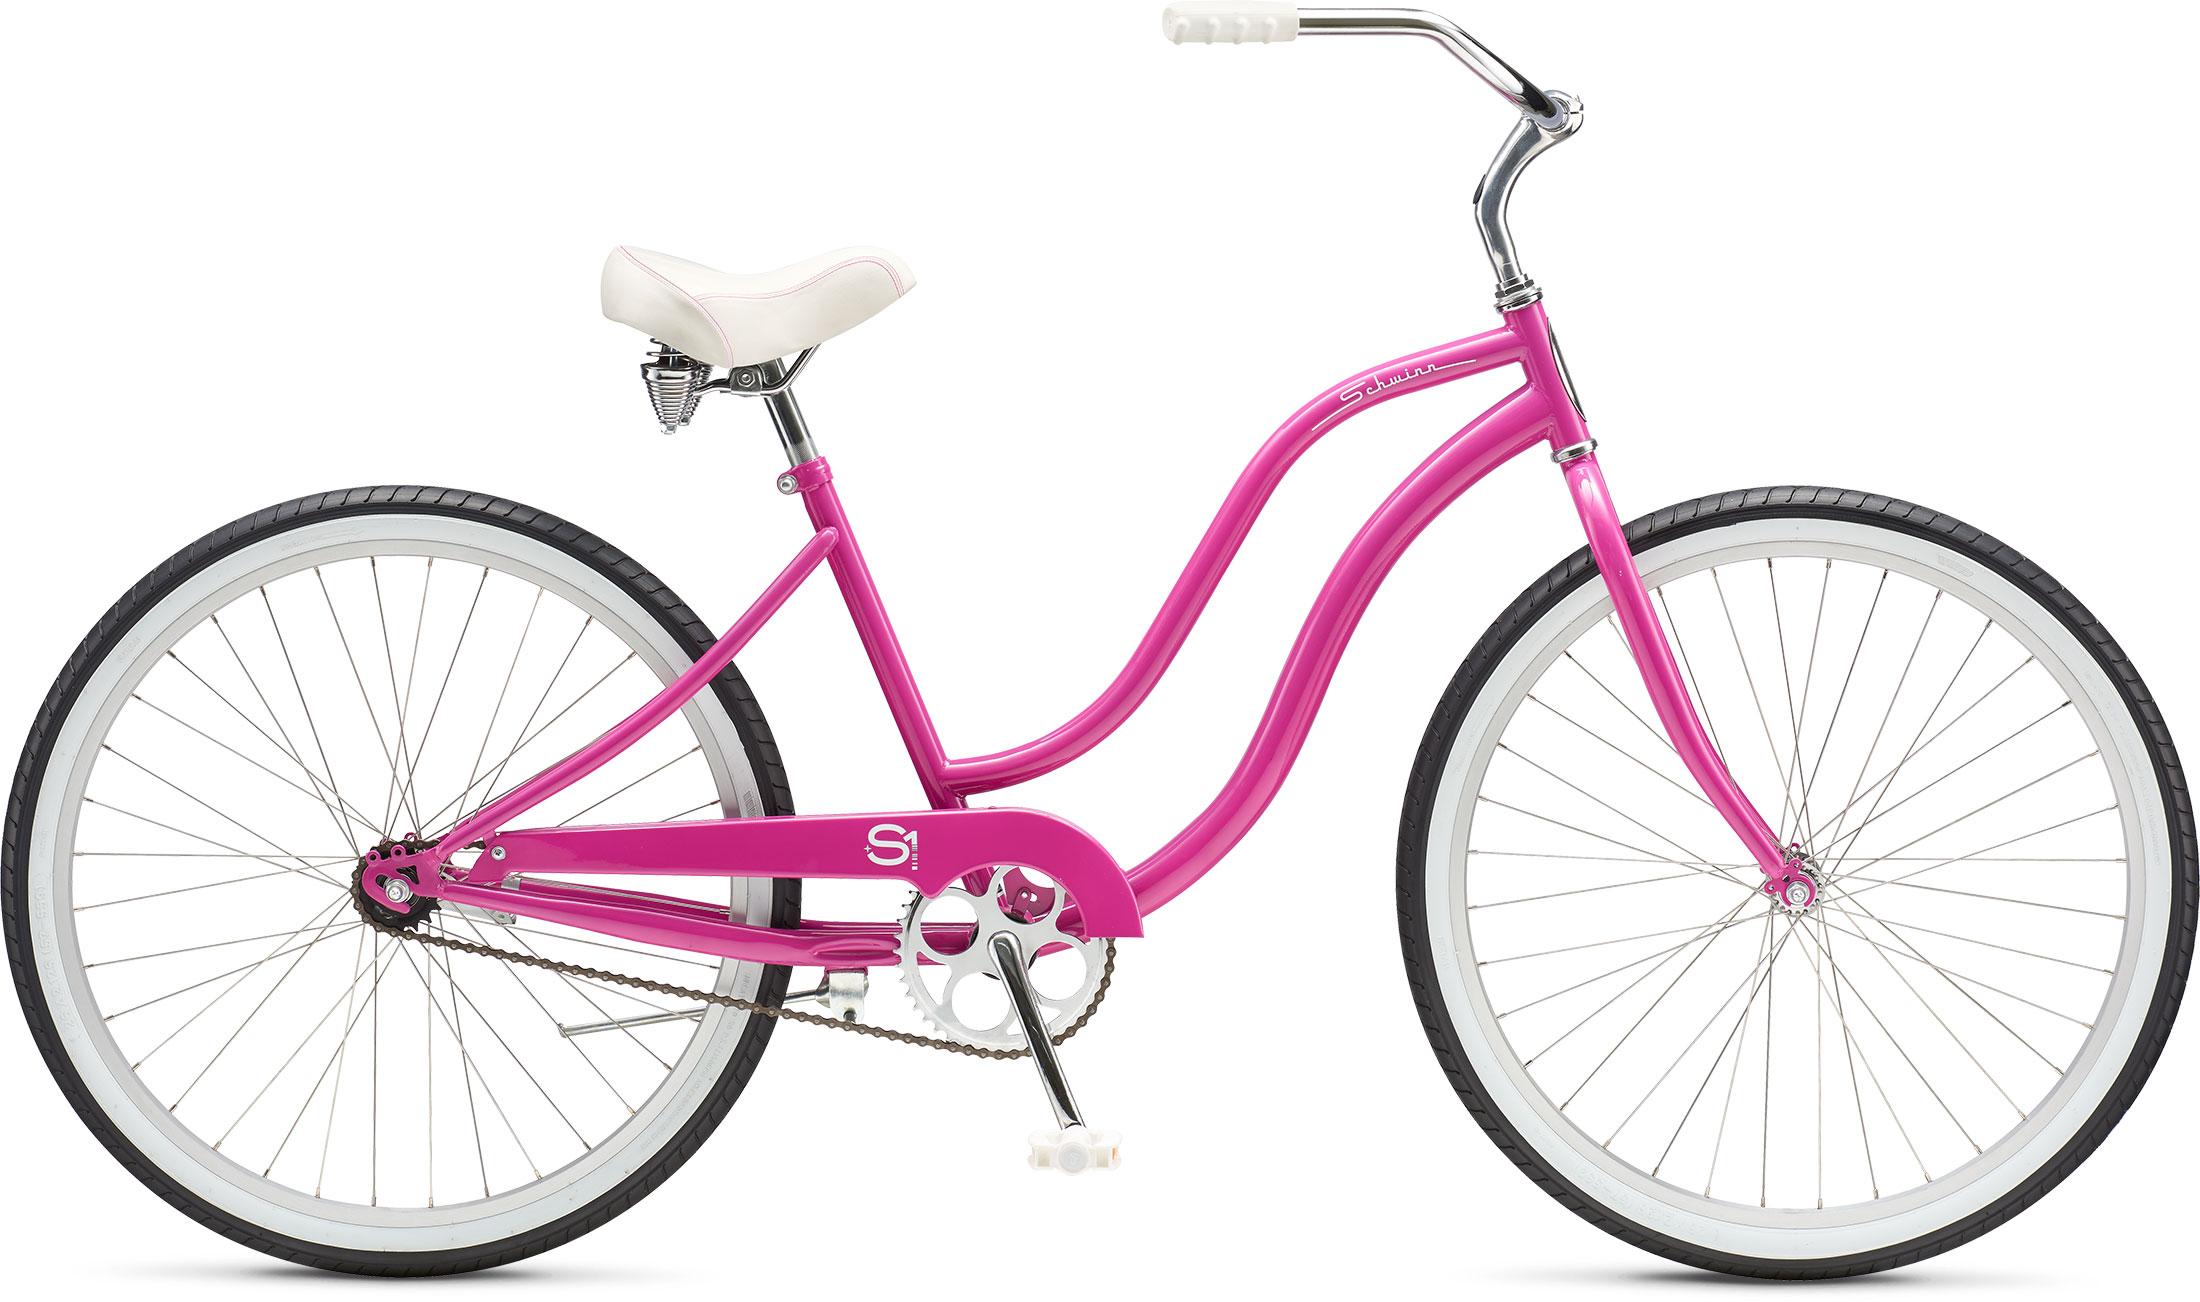 7f5f9a27f99 Schwinn S1 Women's - Spoke Life Cycles   Toledo Ohio